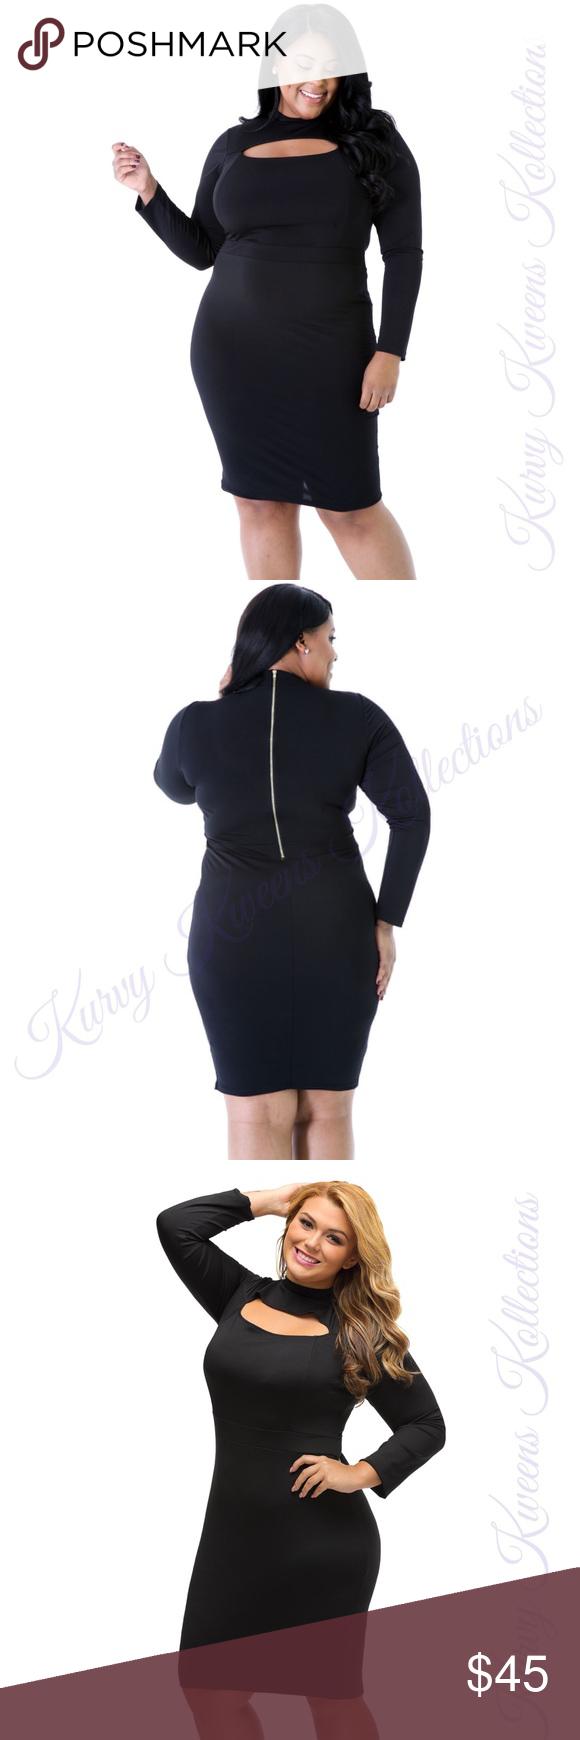 Black keyhole bodycon dress bodycon dress hug and neckline